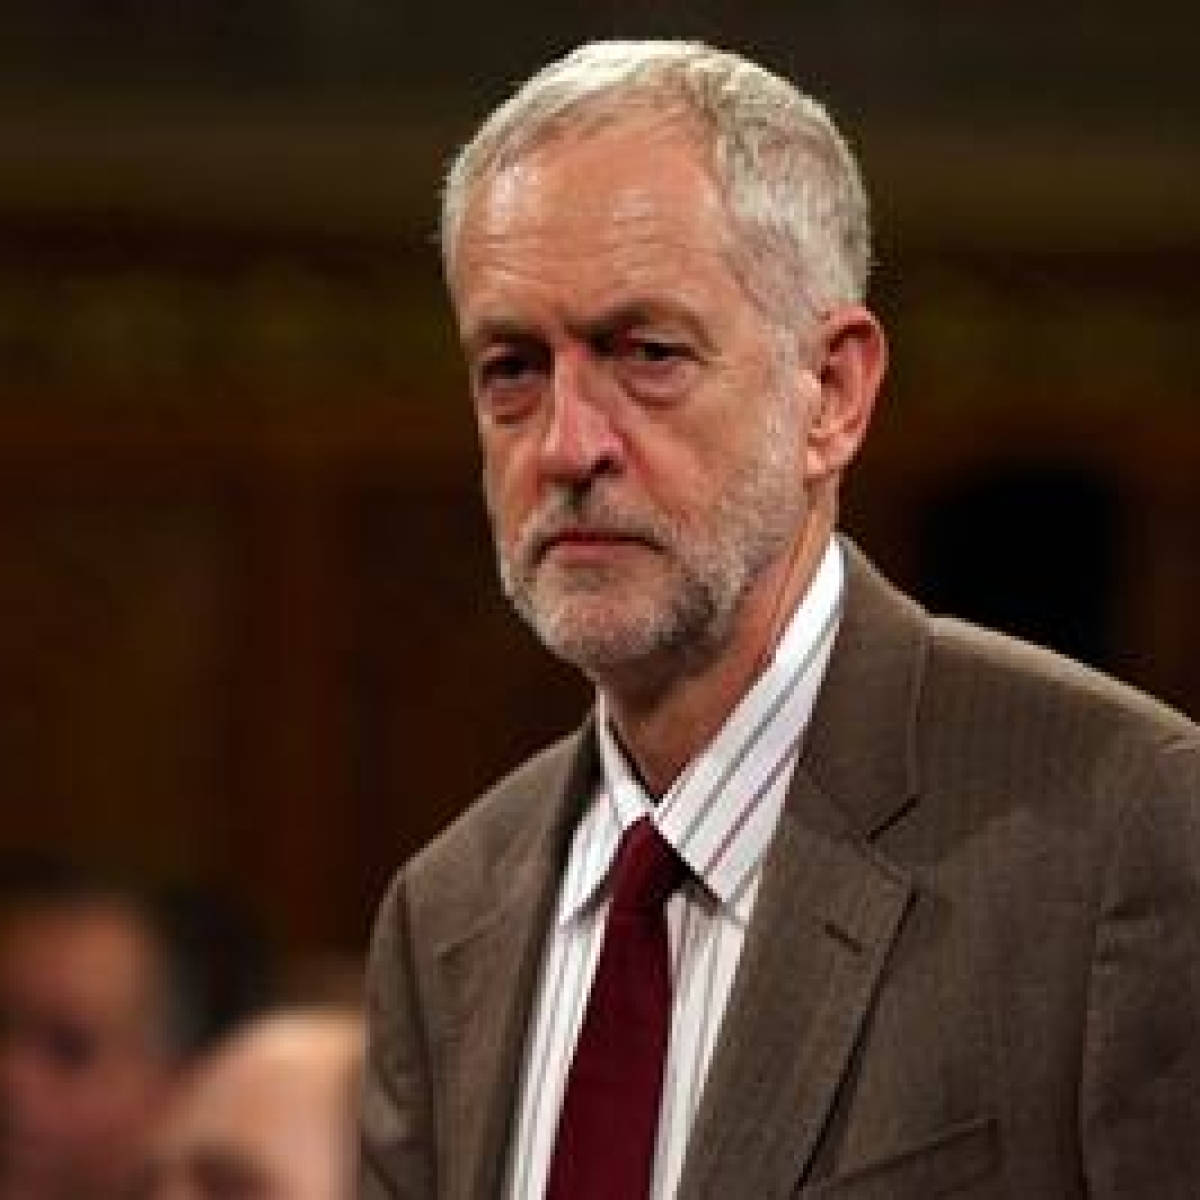 Jallianwala Bagh apology in Jeremy Corbyn's manifesto